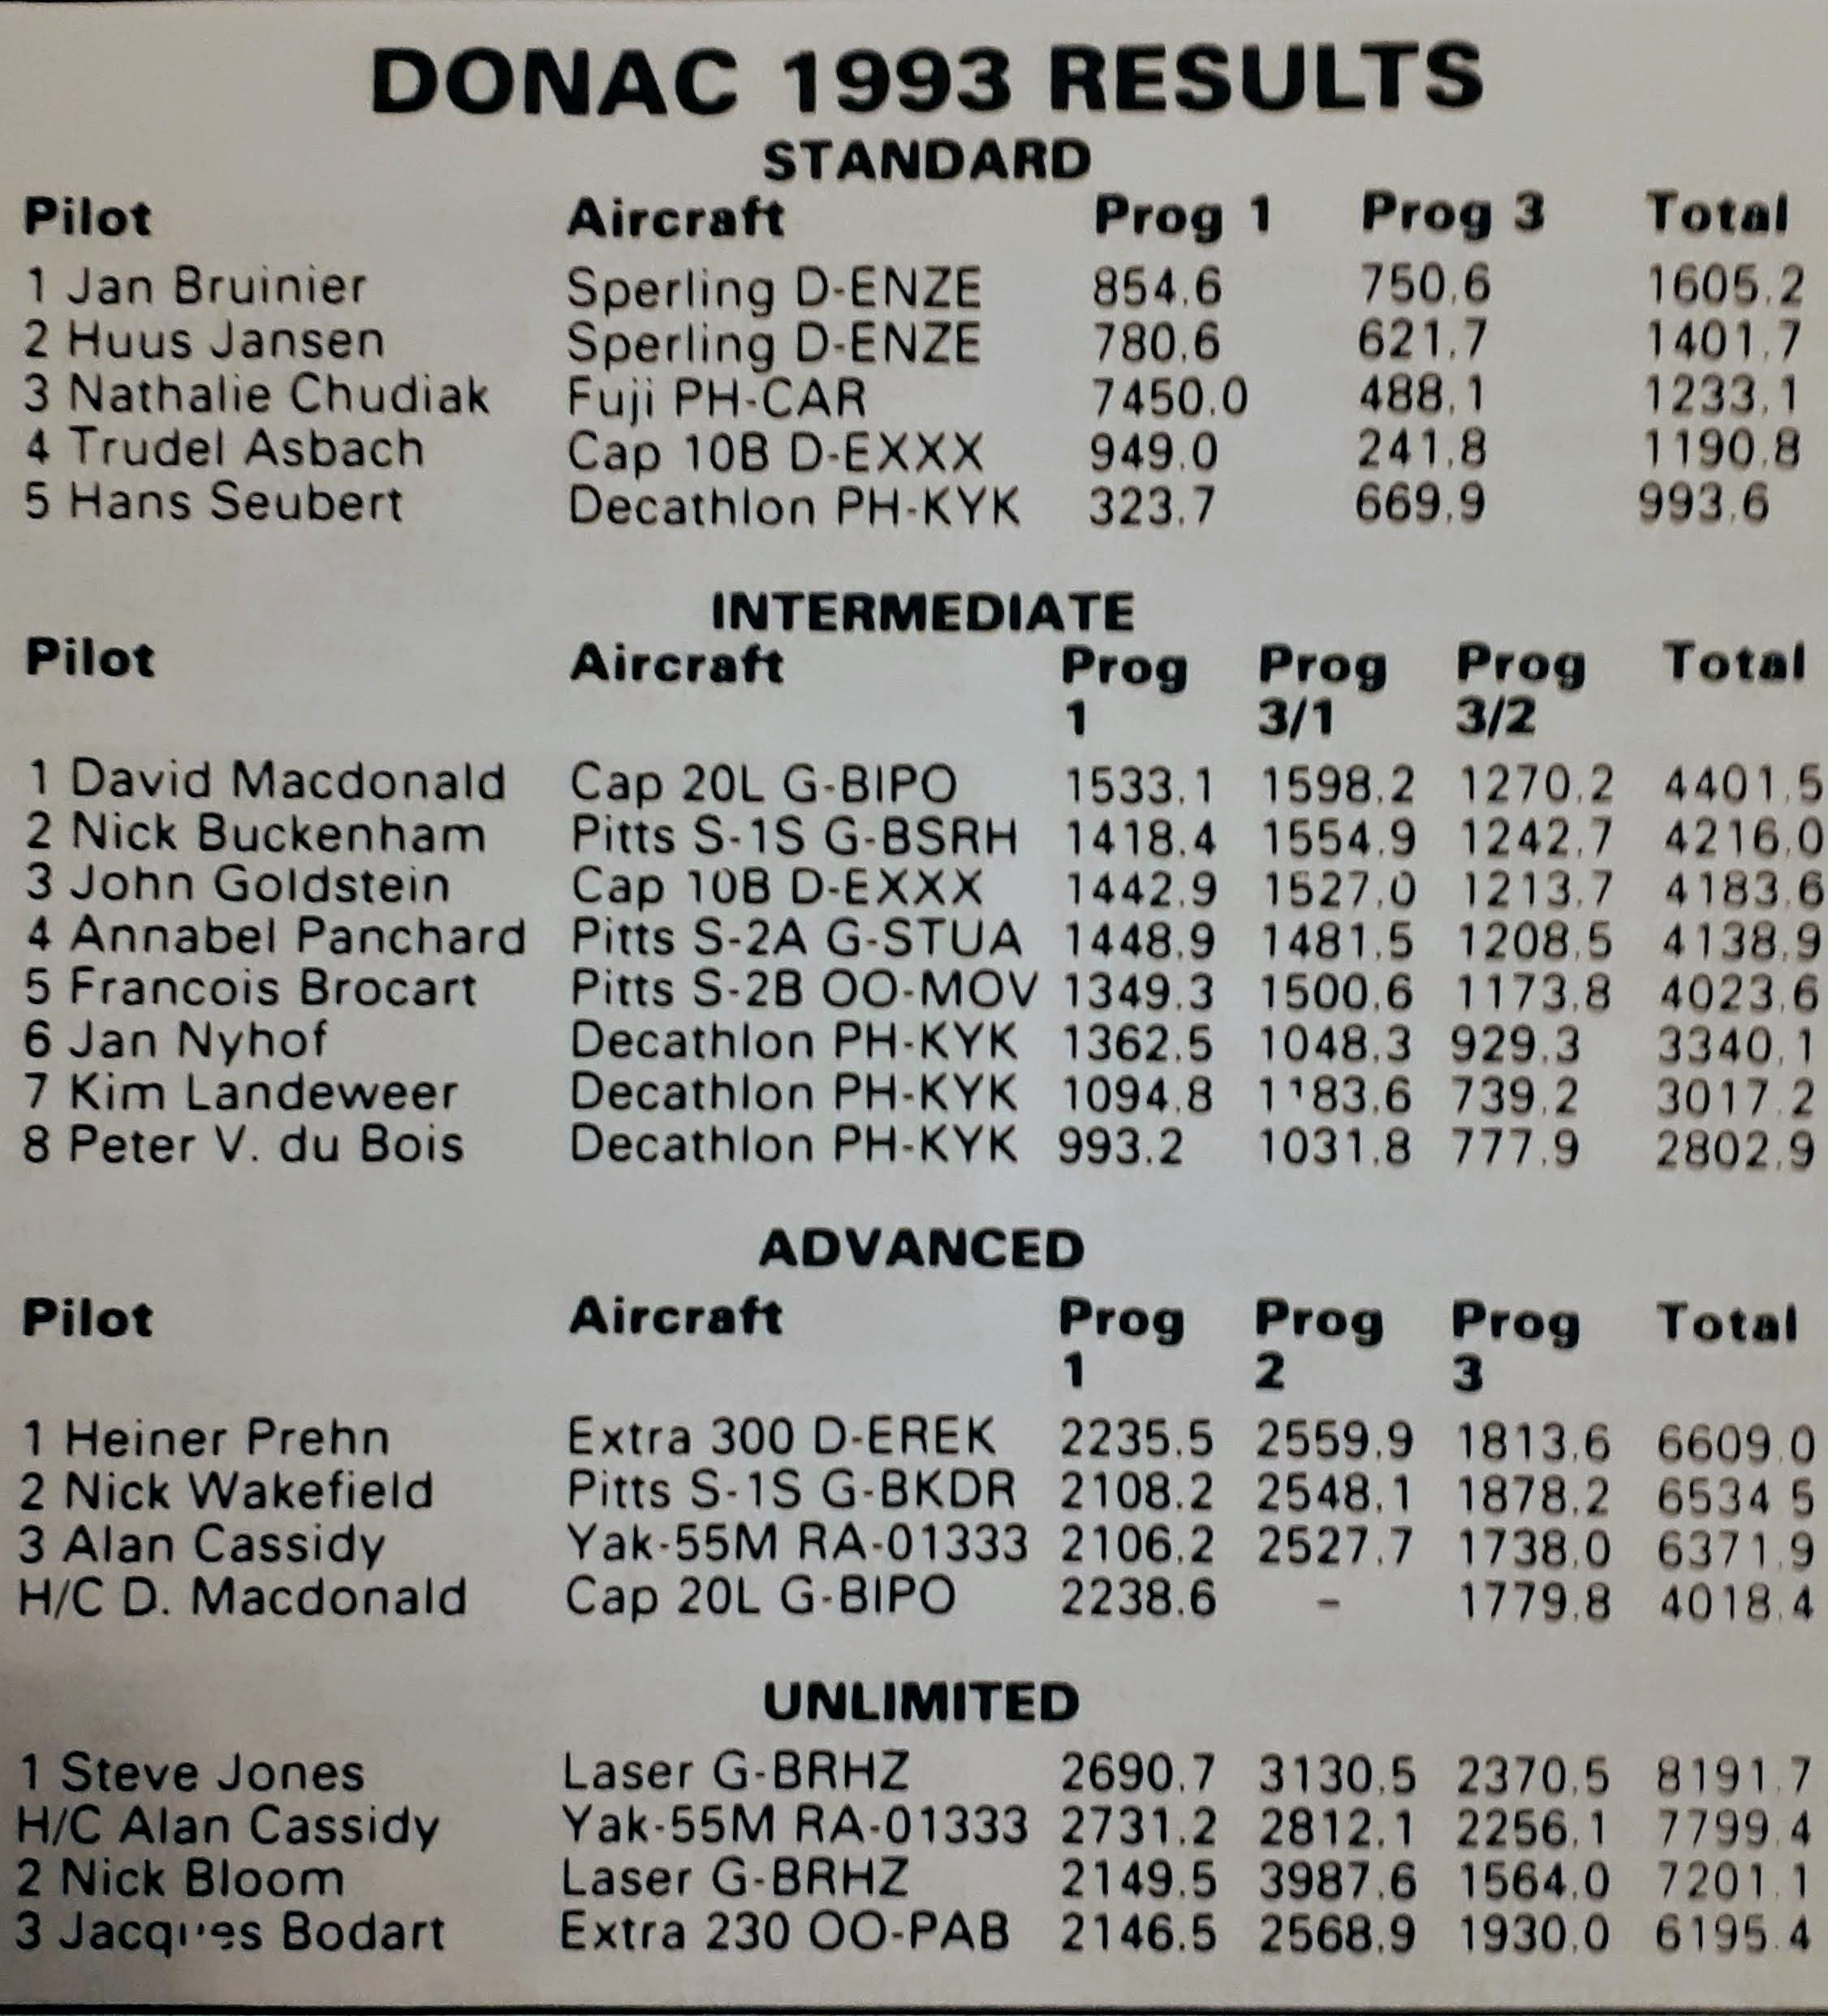 DONAC 1993 results